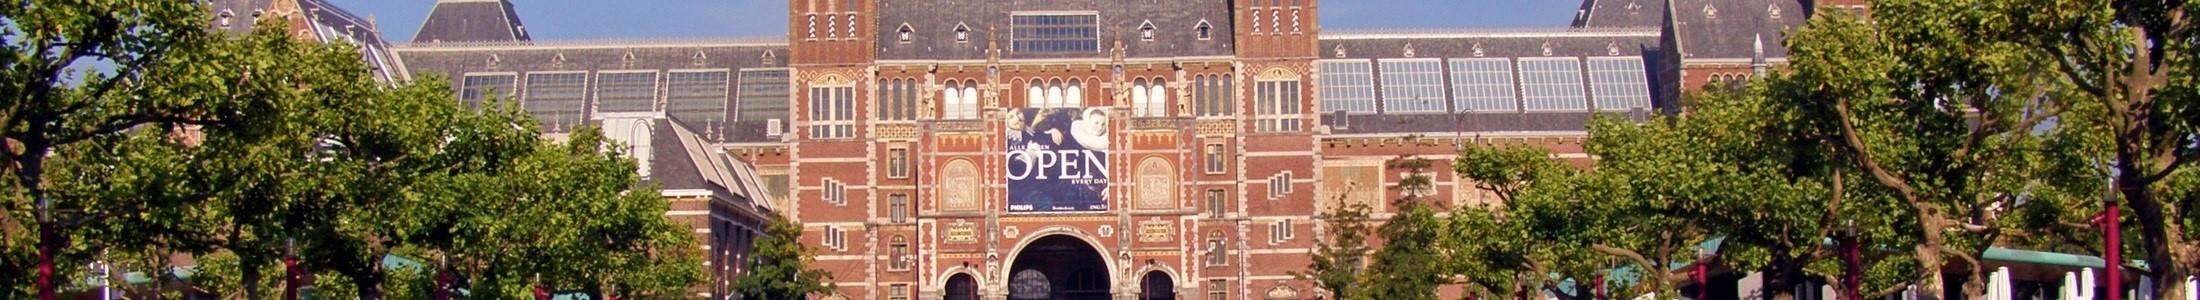 Narrowcasting museum digital signage